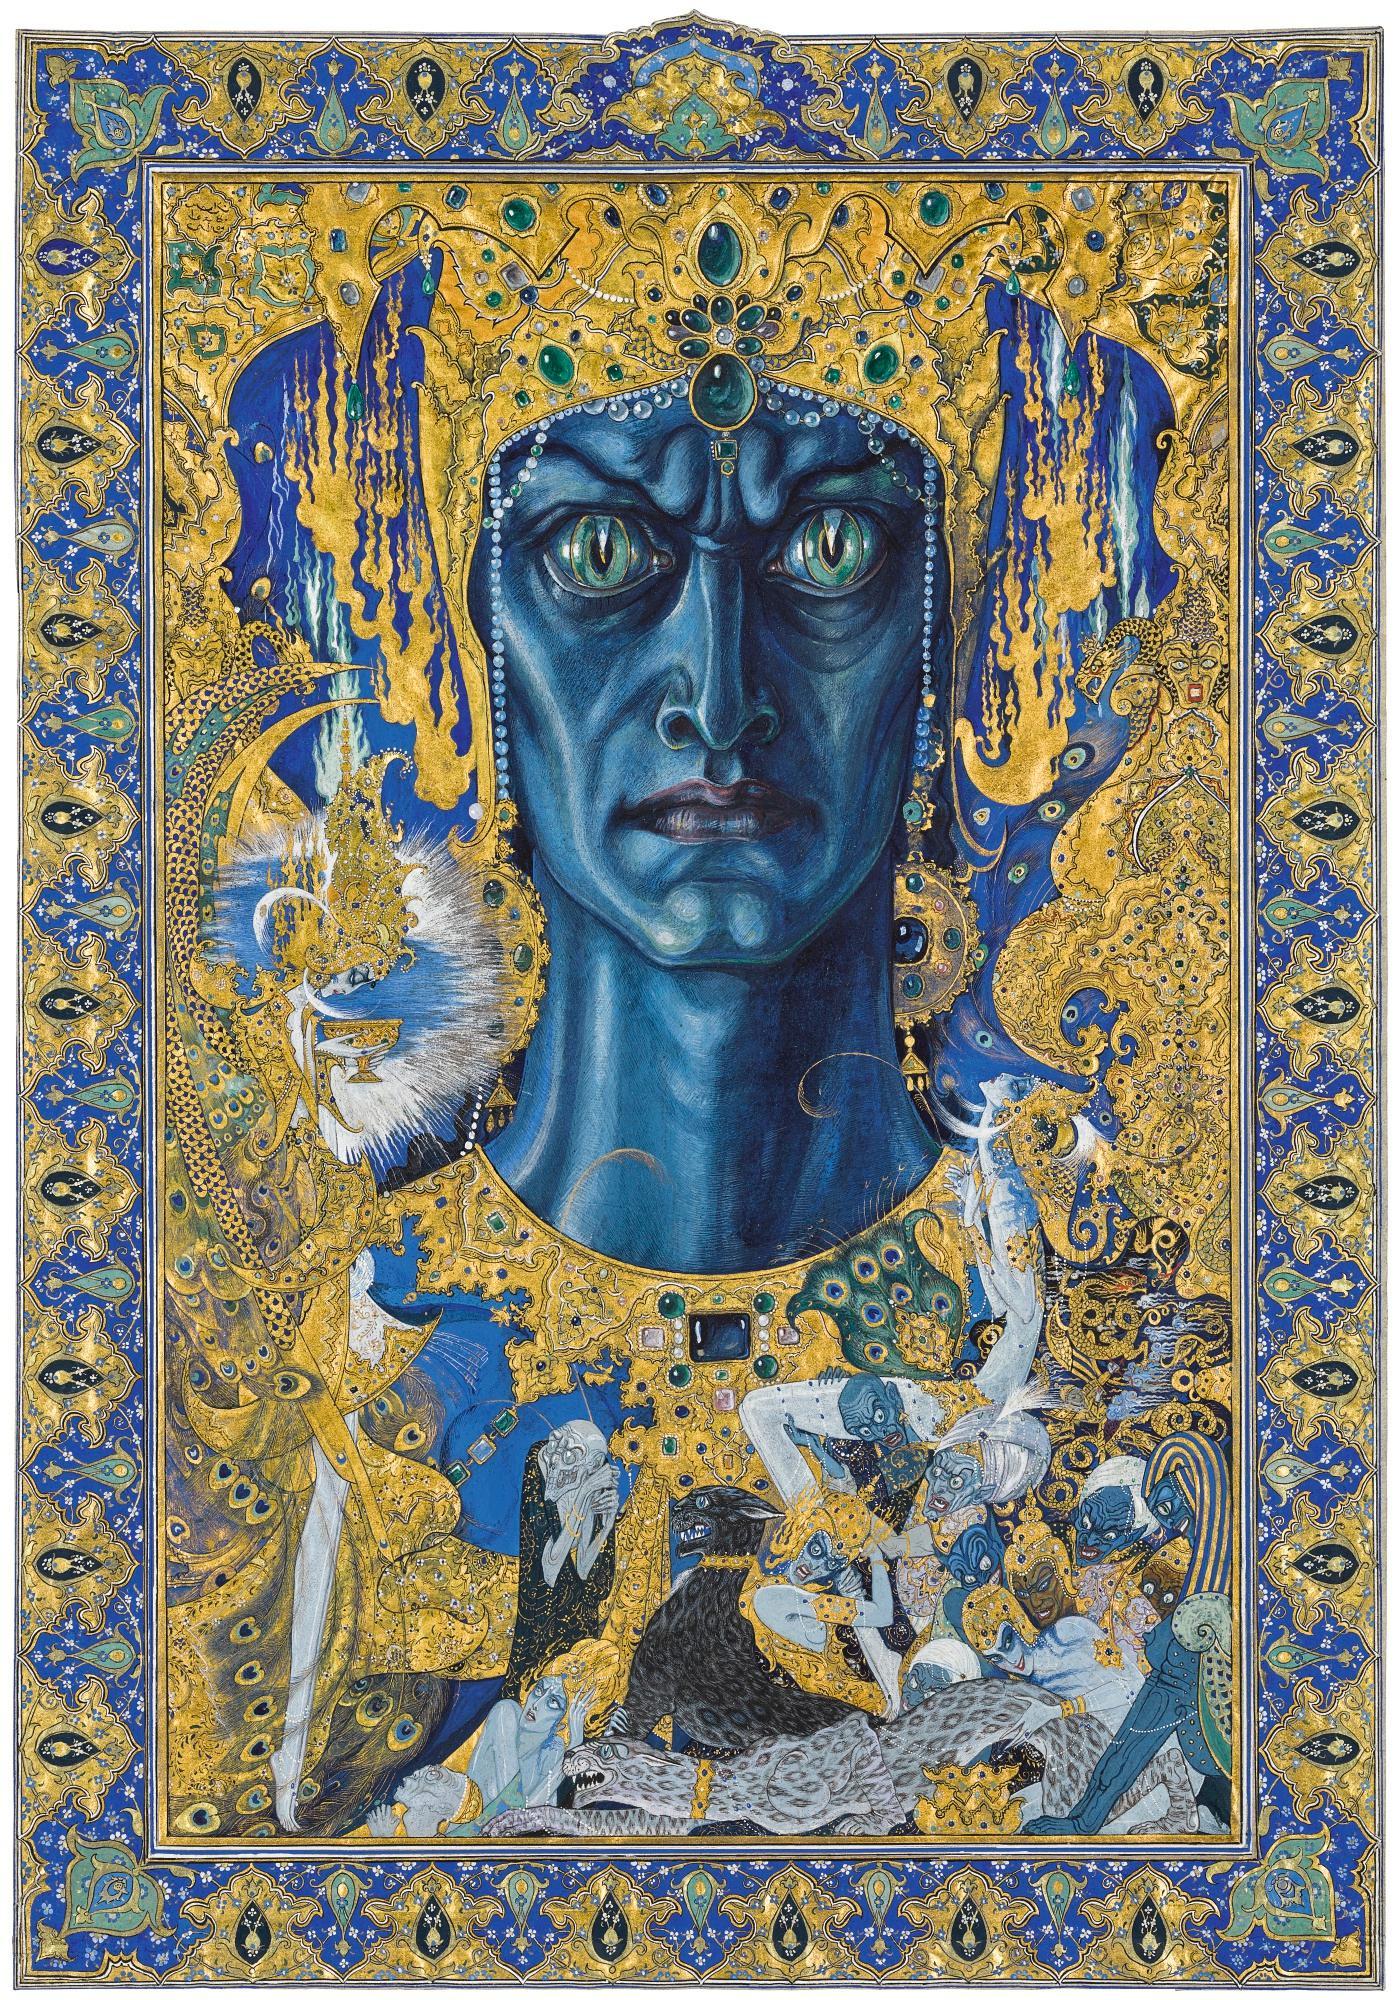 PAUL MAK | Egyptian Fantasy